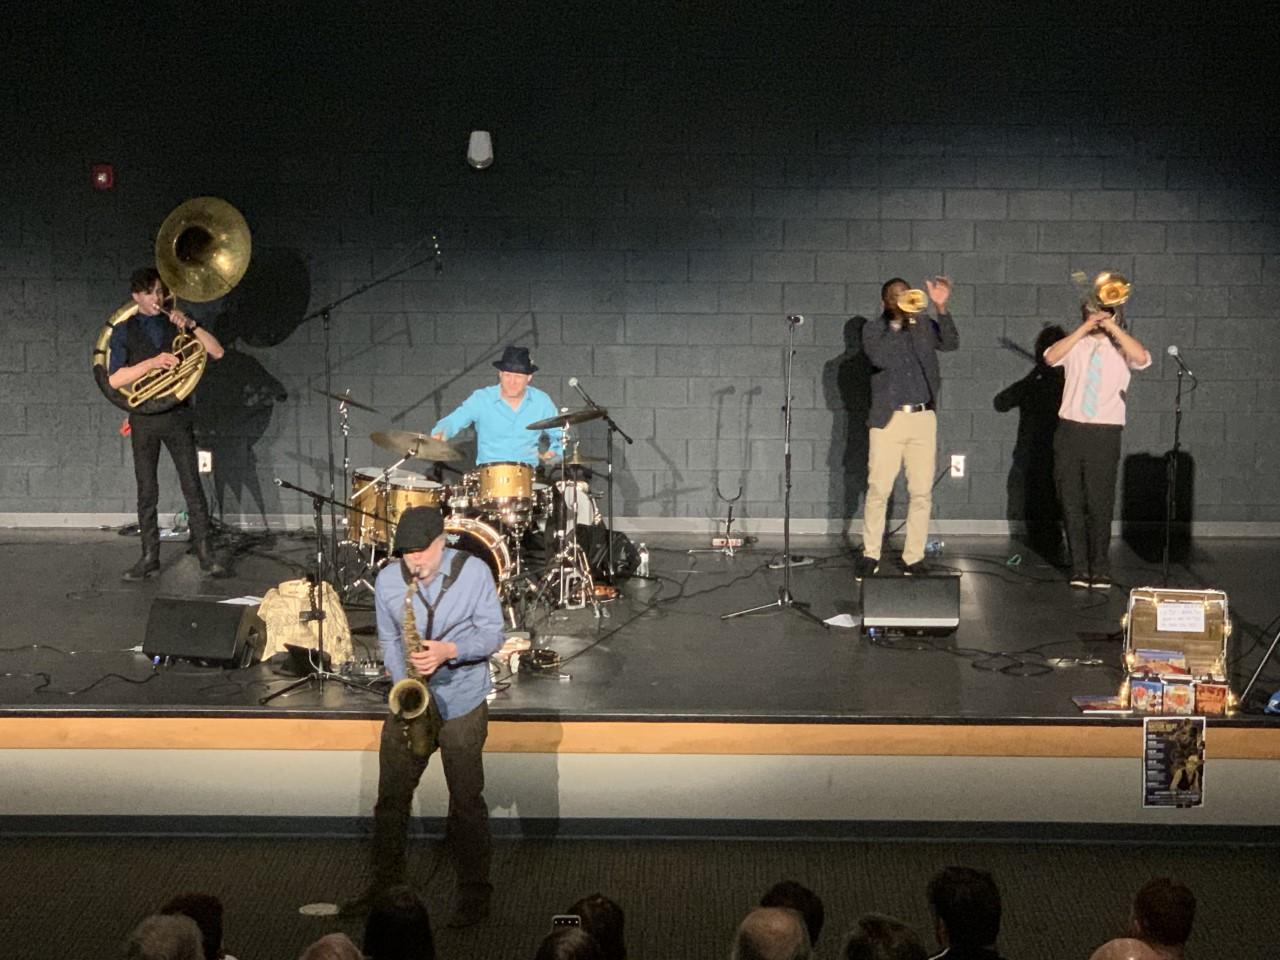 Tenor sax musician showing off his skill